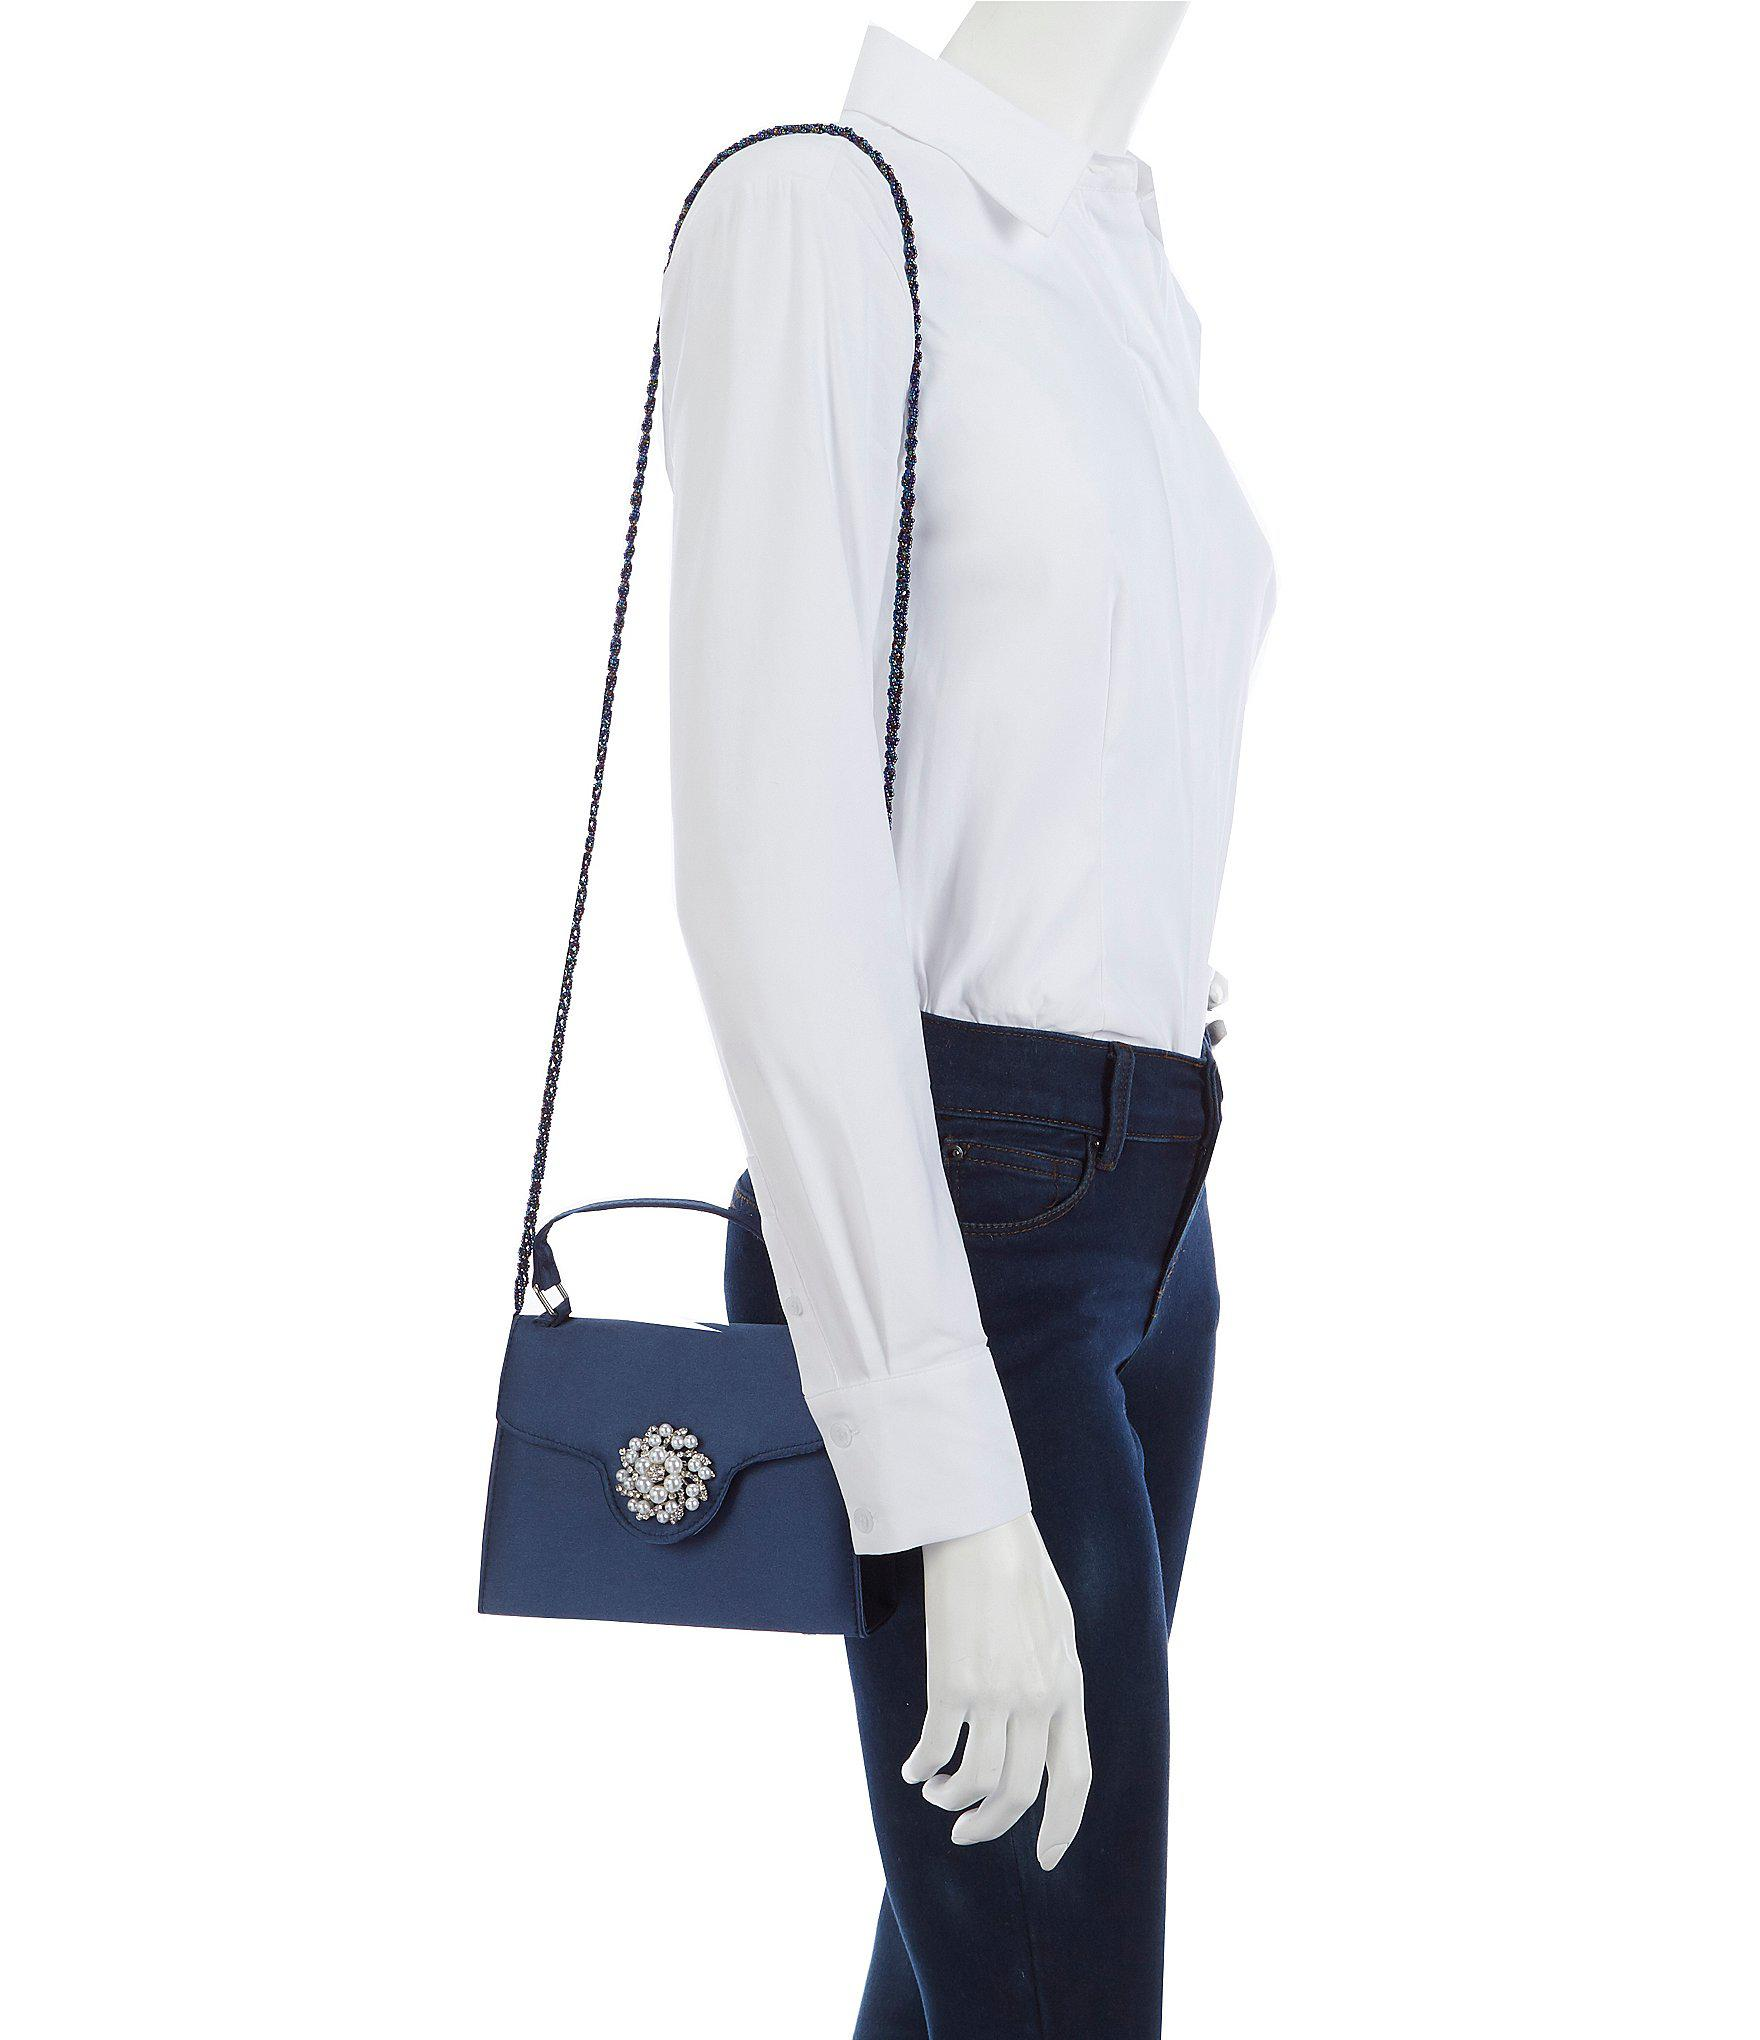 42ecf8576 Lyst - Nina Top-handle Crystal Jeweled Satin Clutch in Blue